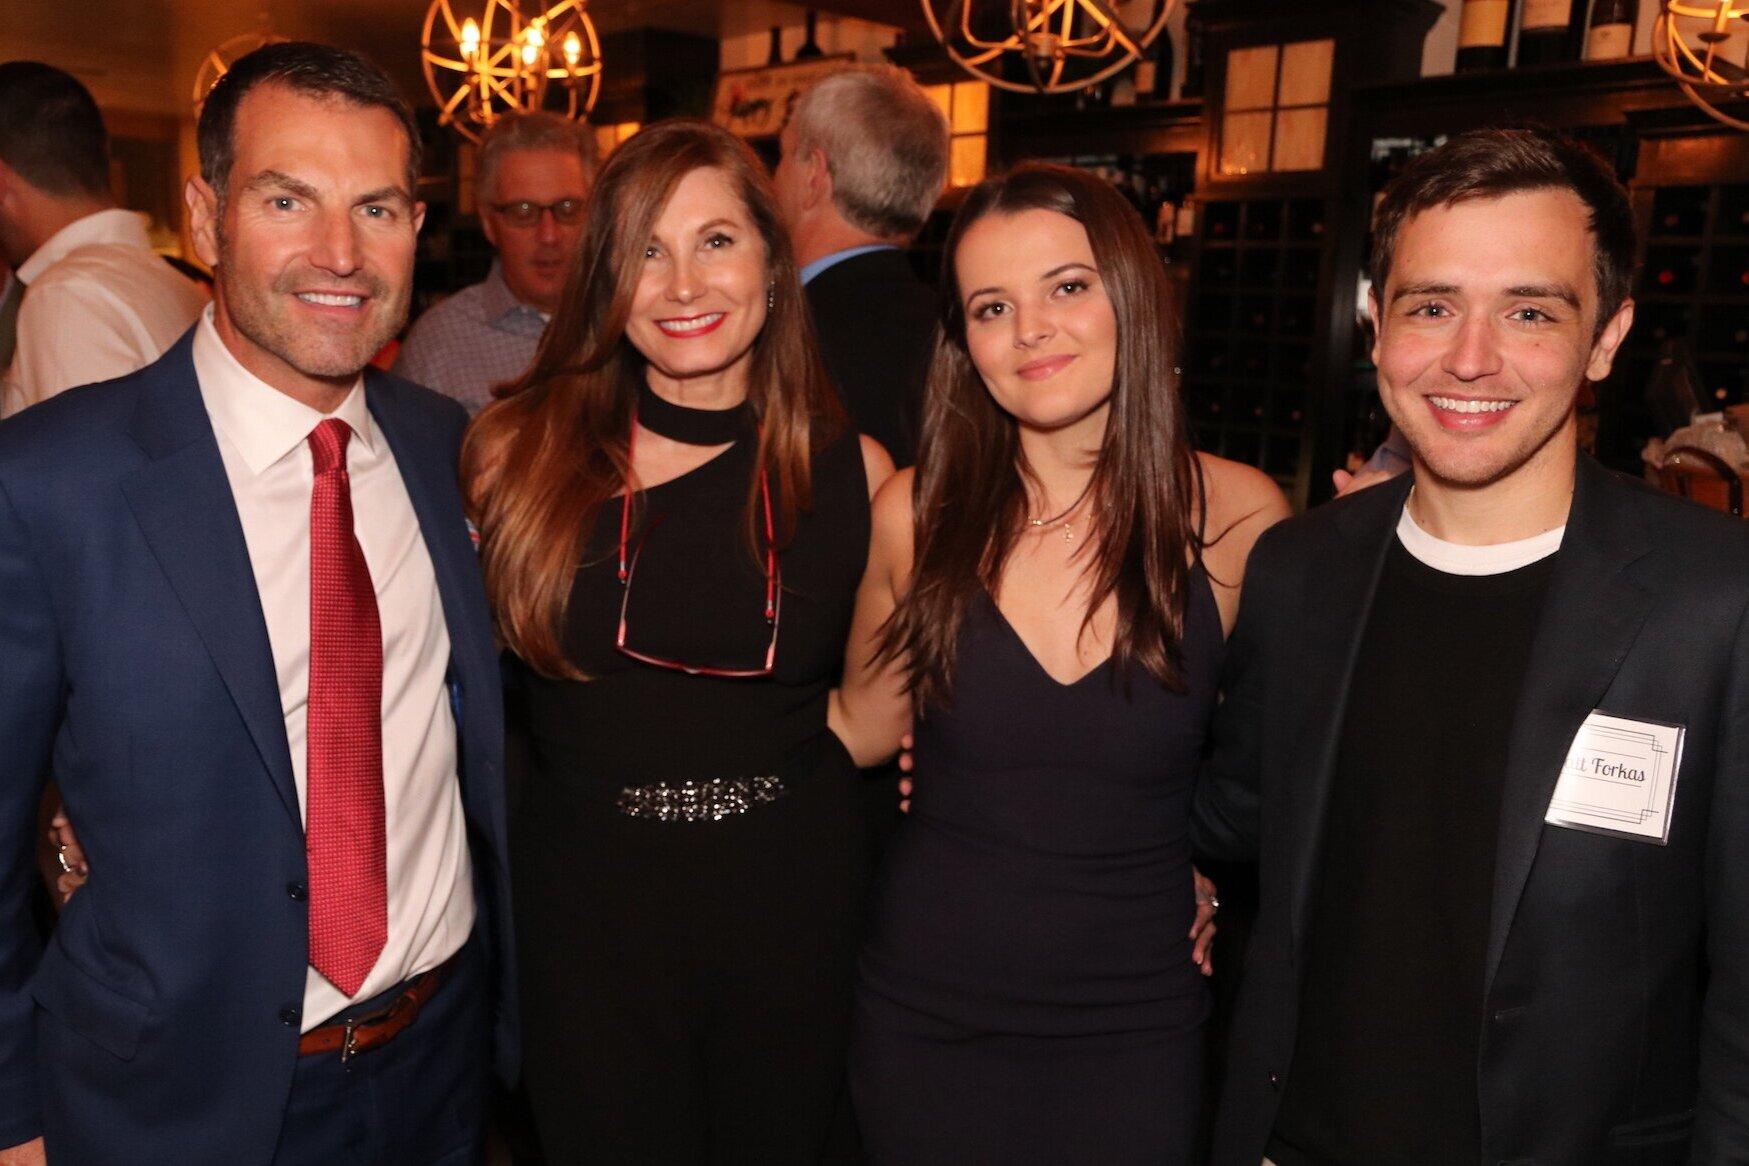 The Forkas Family: Len Forkas, Elizabeth Forkas, Viena Forkas and Matt Forkas